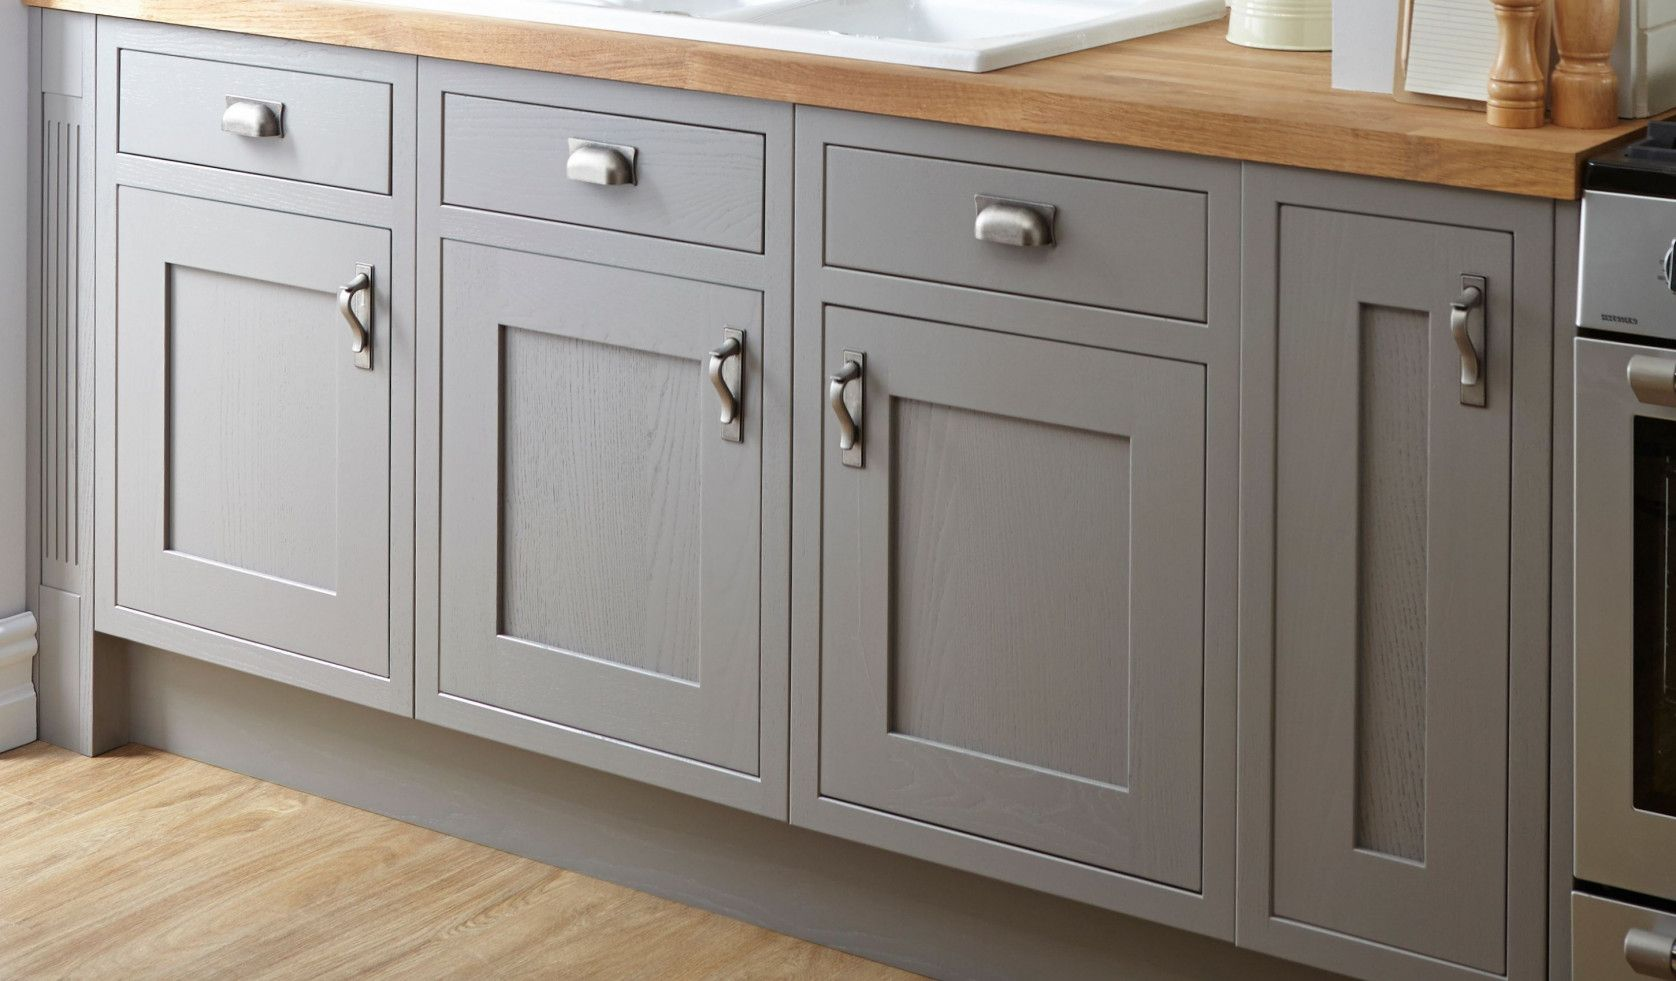 55 discount replacement kitchen cabinet doors apartment kitchen rh pinterest com